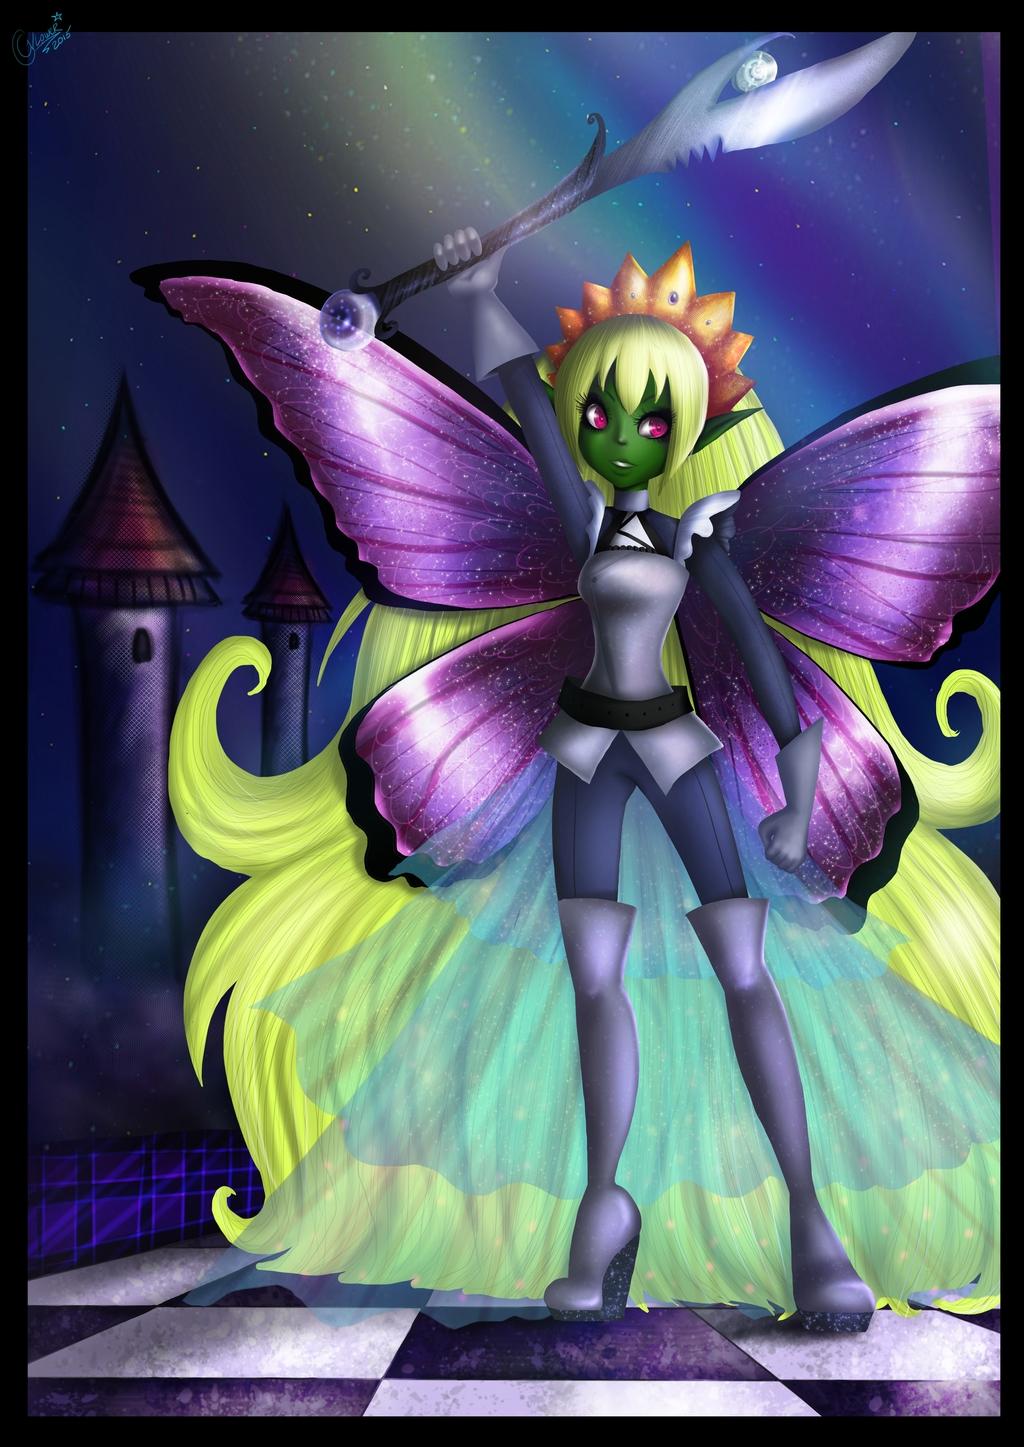 Vlower the Fairy Queen